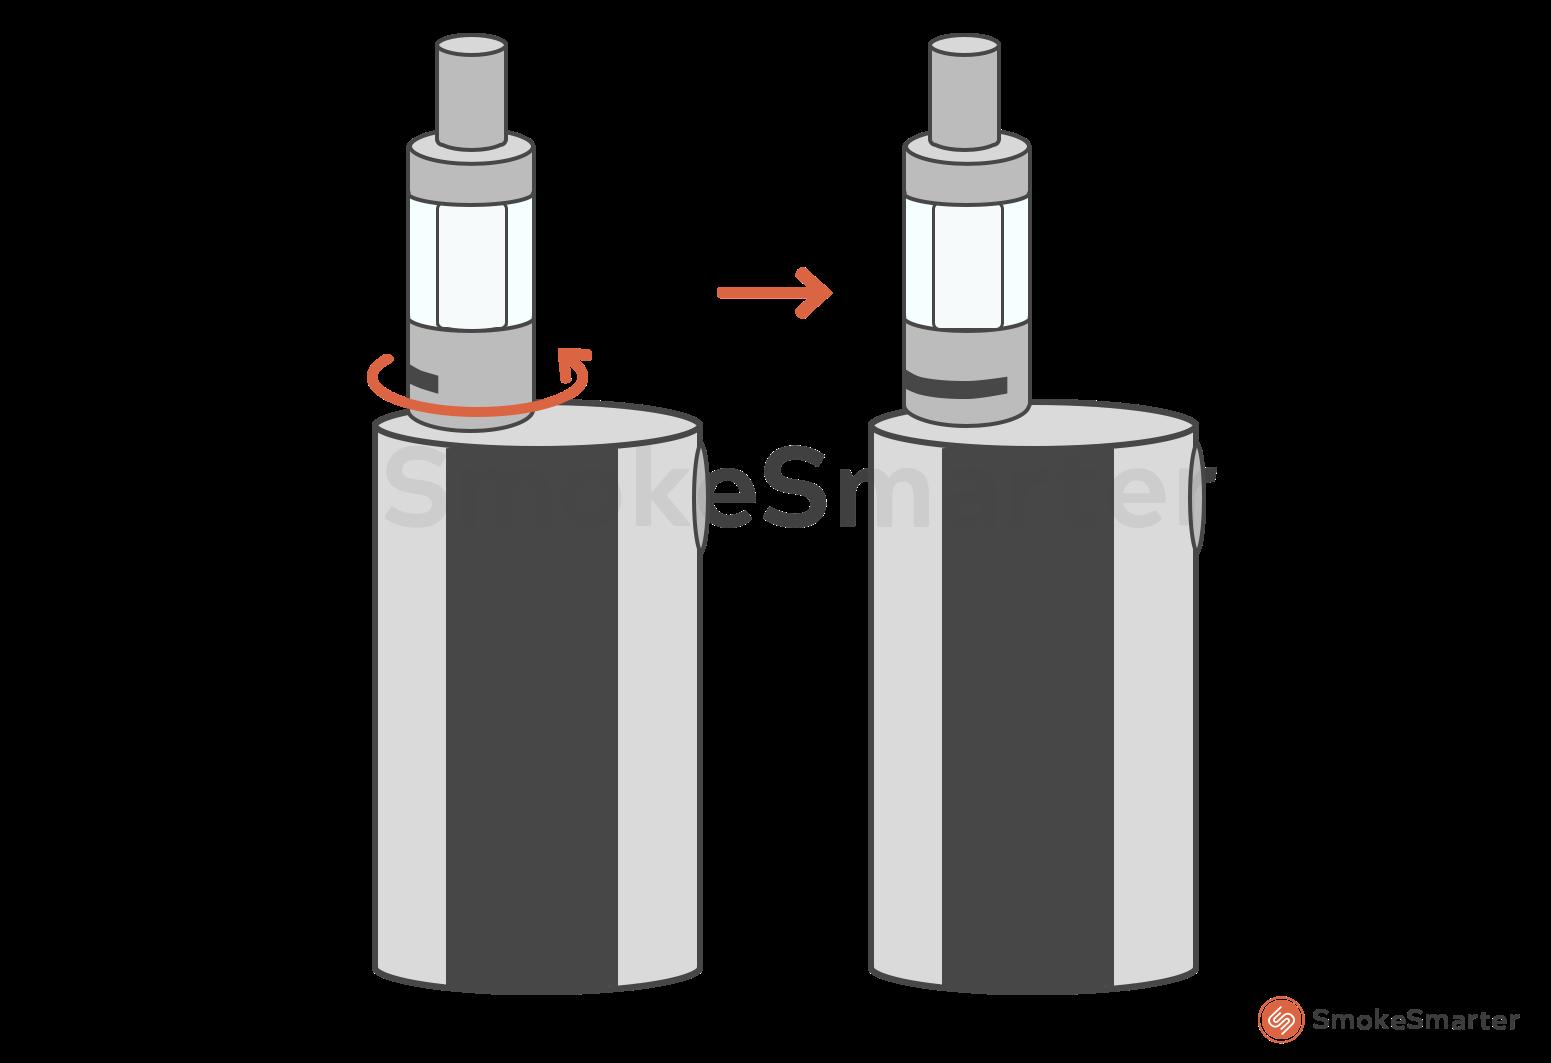 E-sigaret en clearomizer lekt - Airflow en luchttoevoer